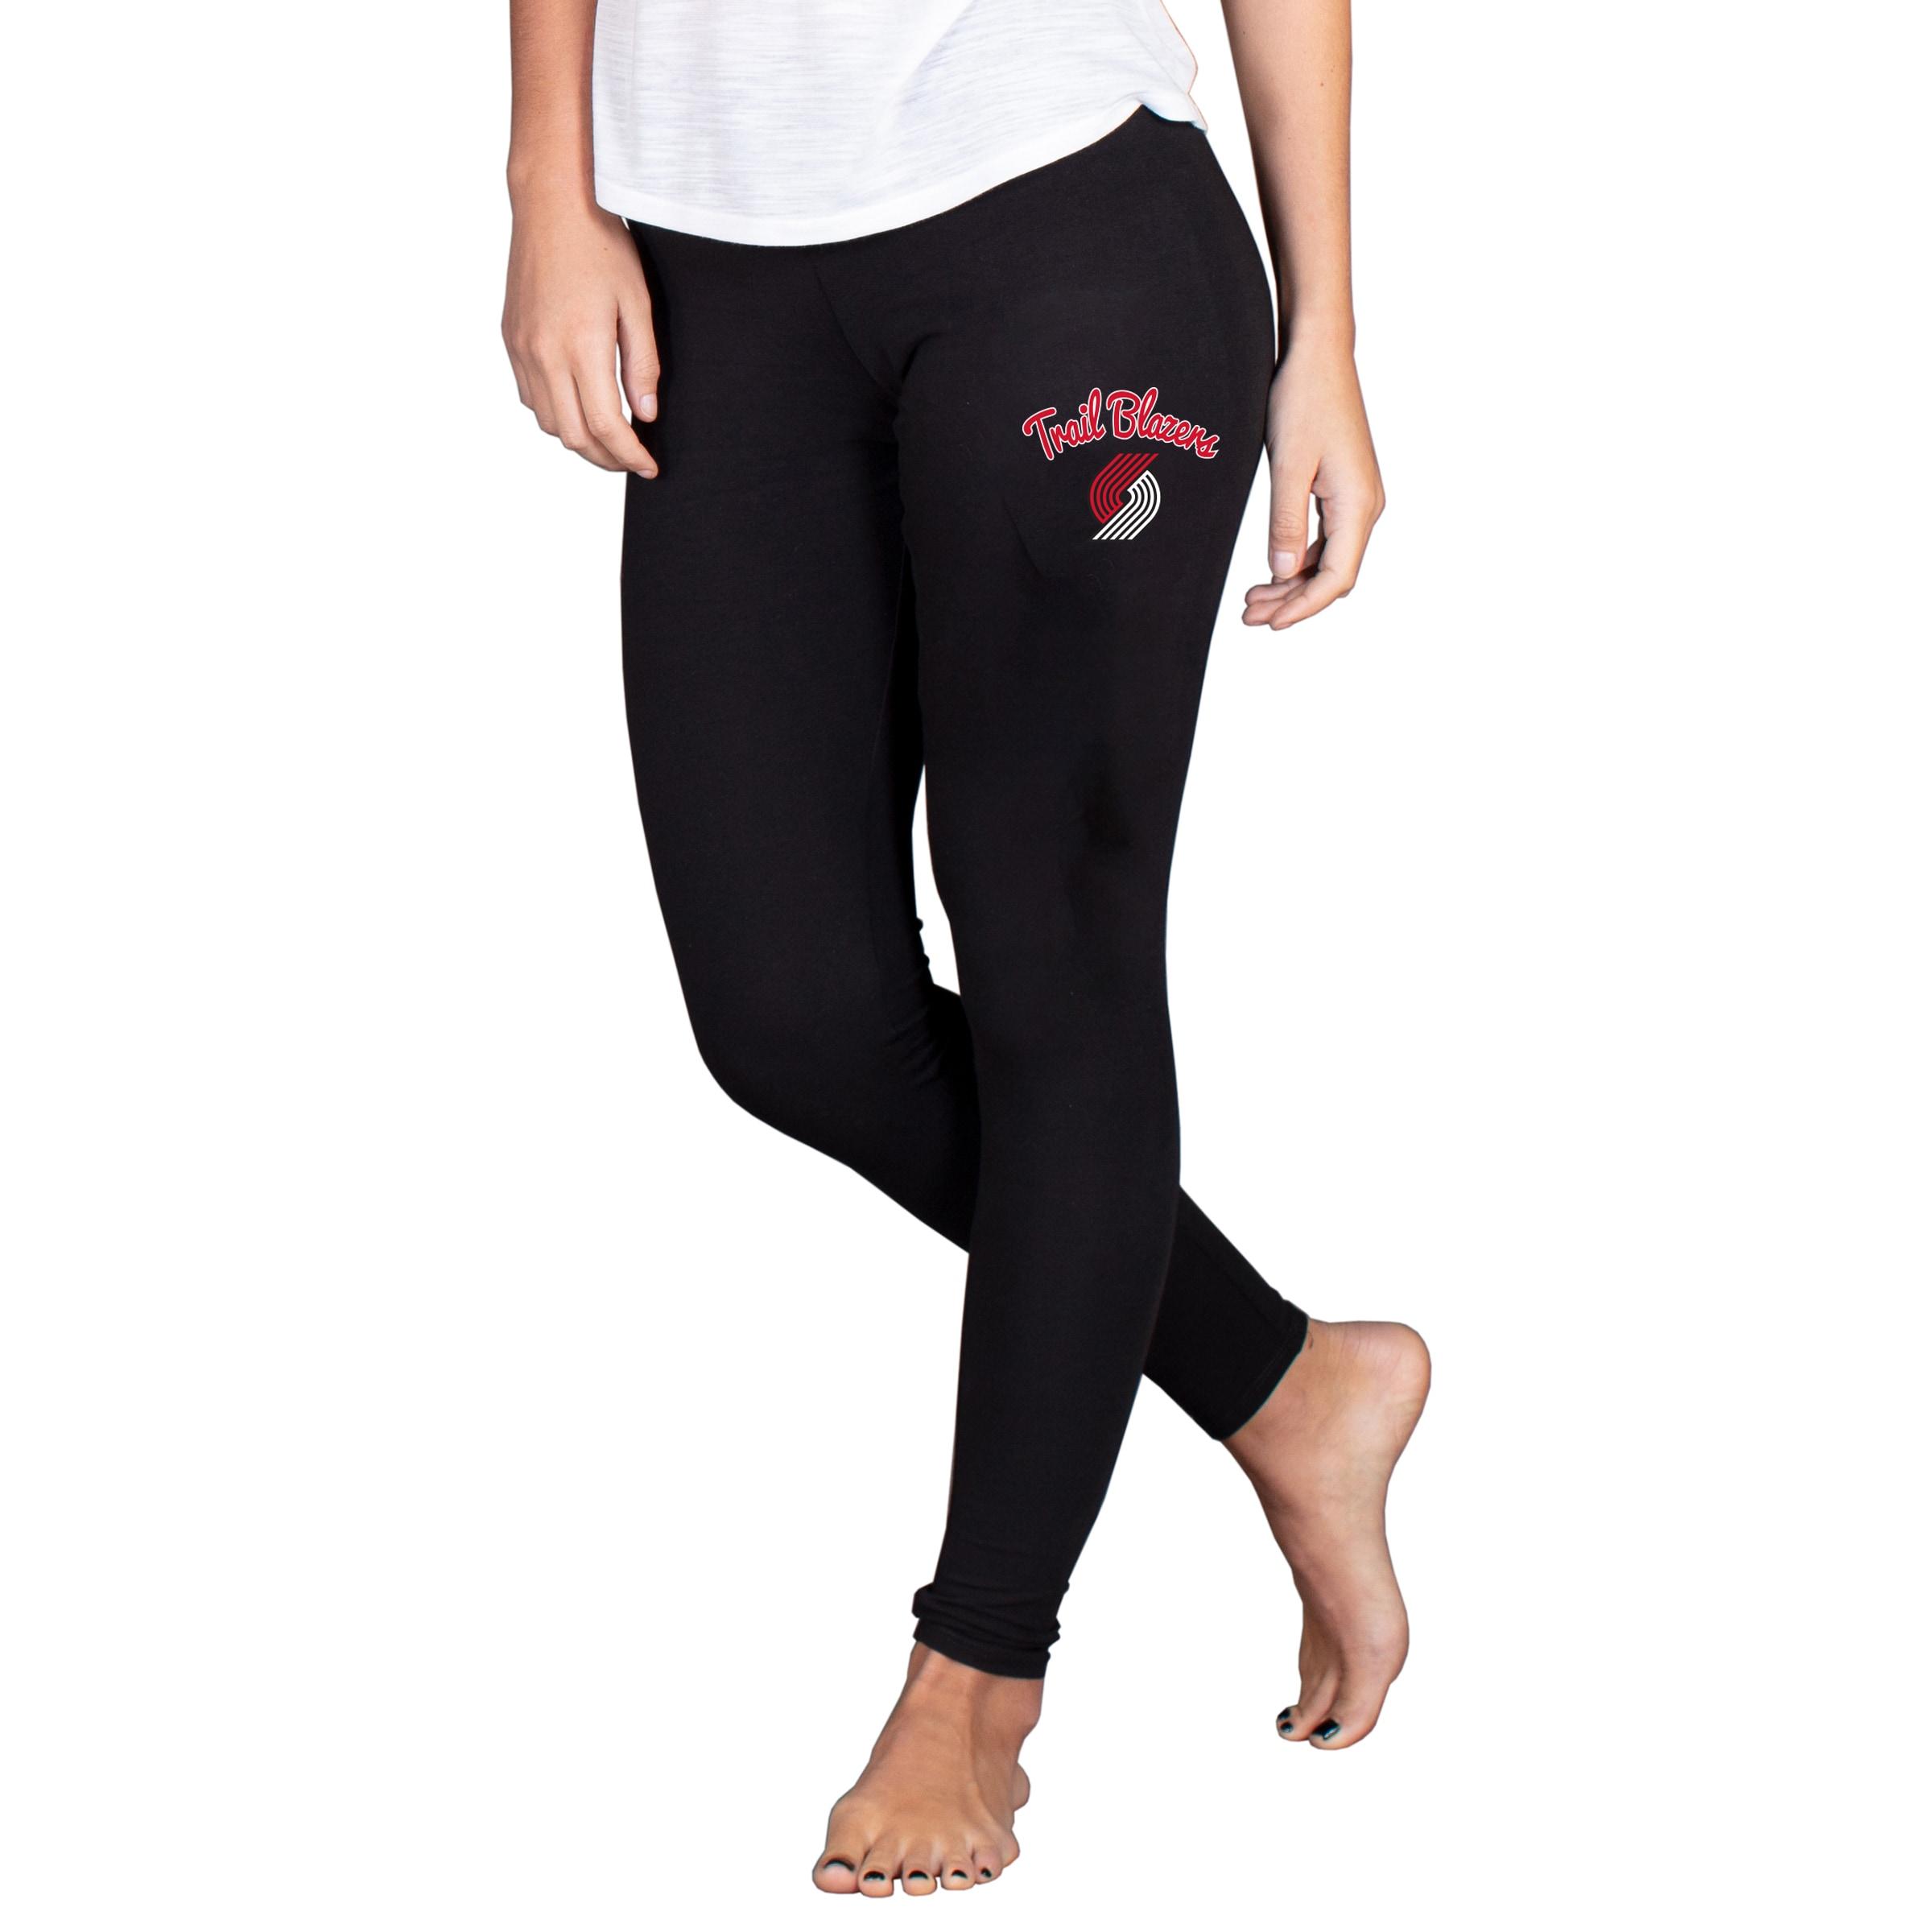 Portland Trail Blazers Concepts Sport Women's Fraction Leggings - Black